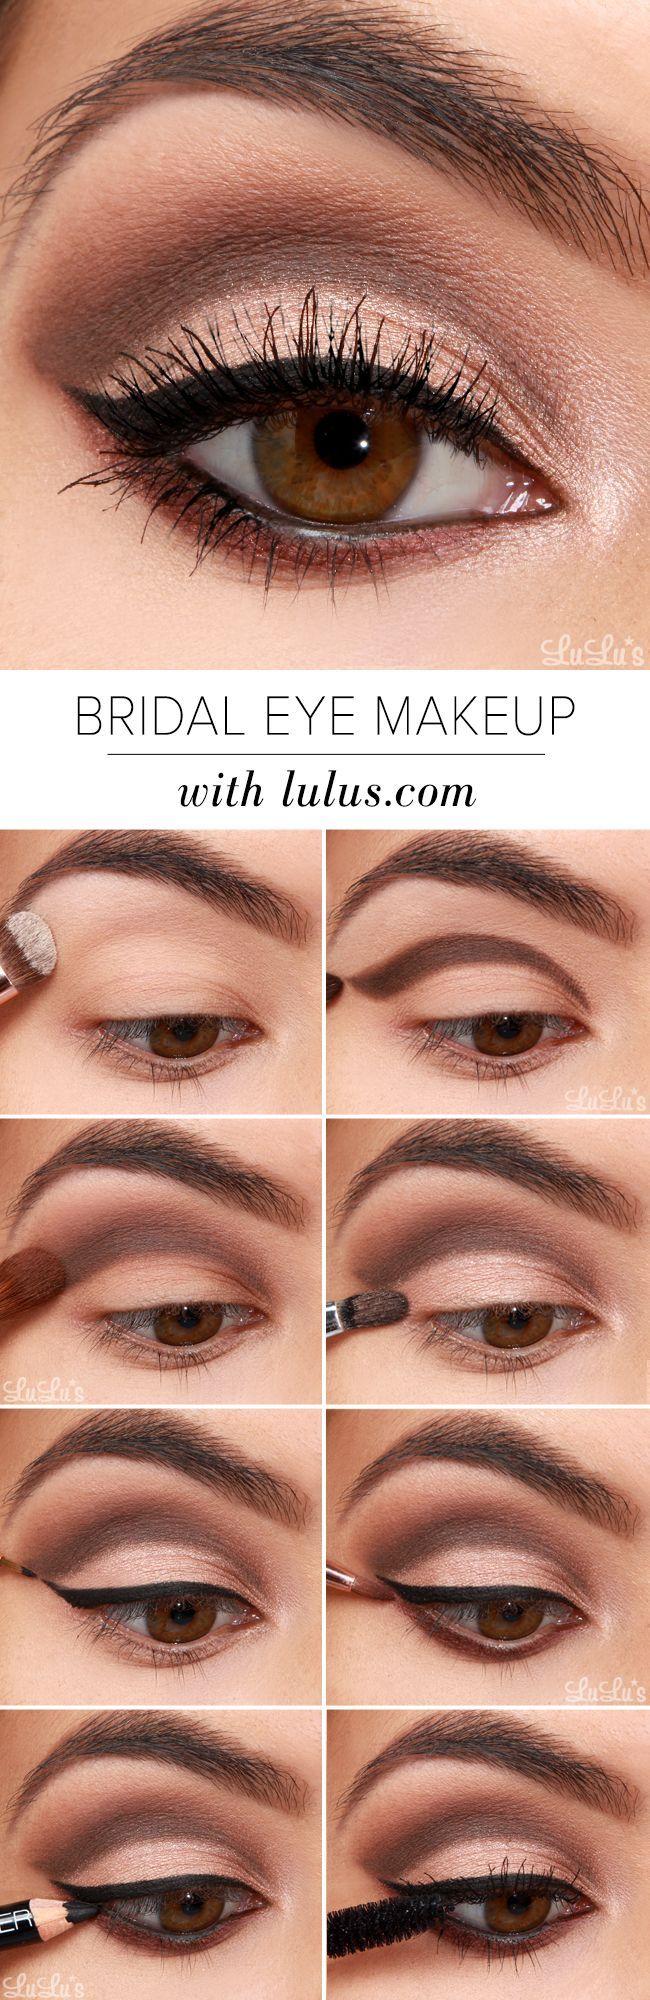 L'oreal eye makeup remover coupons - Lulu S How To Bridal Eye Makeup Tutorial Coupon Code Nicesup123 Gets